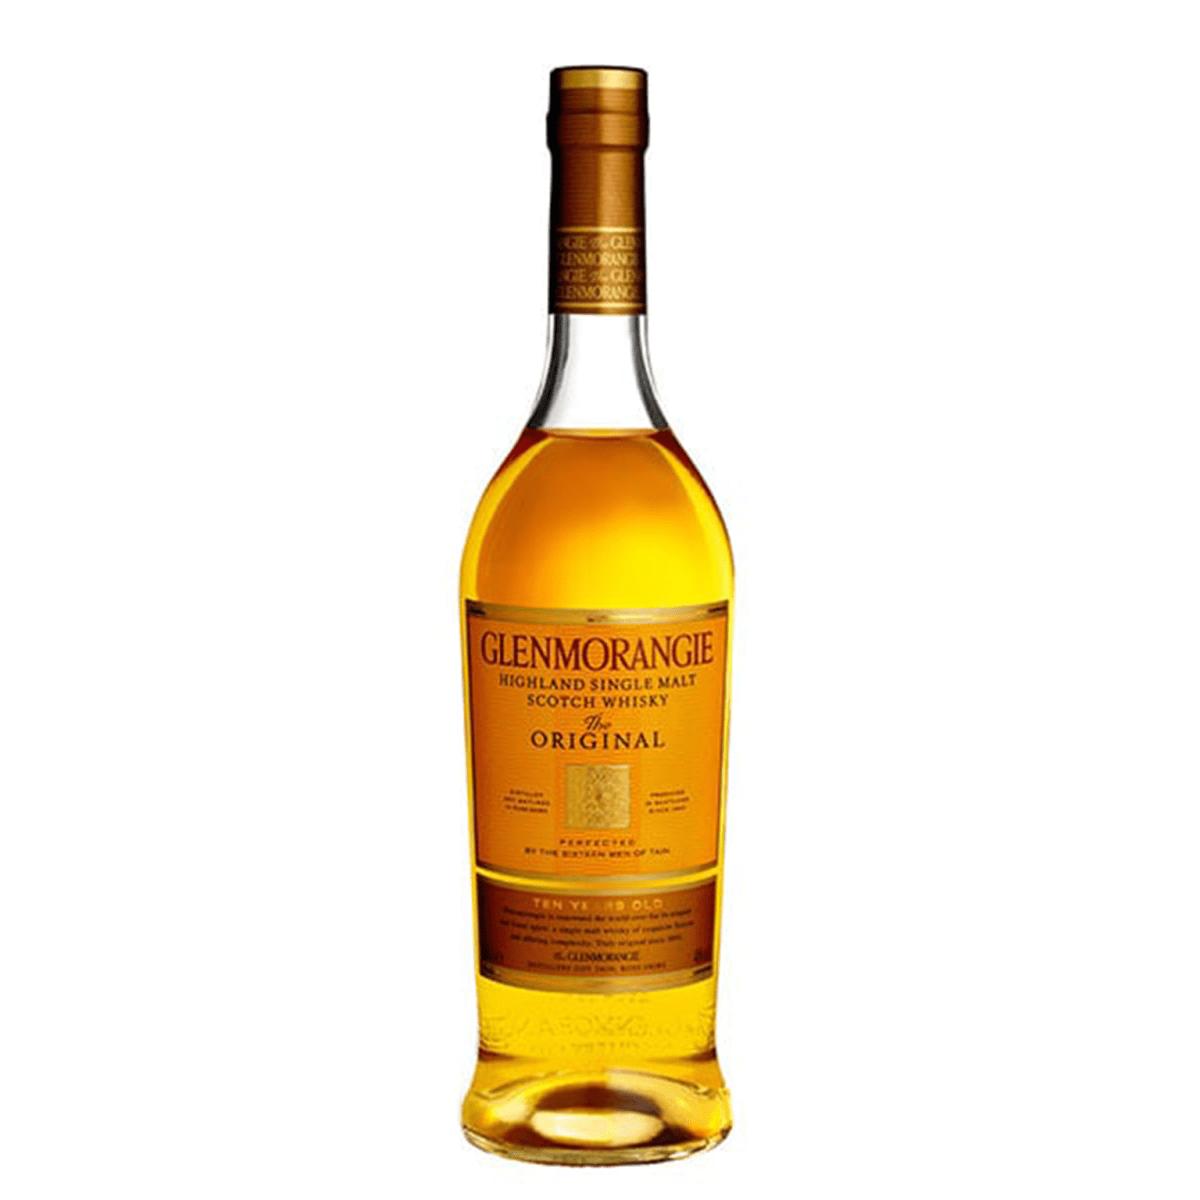 Glenmoran scotch